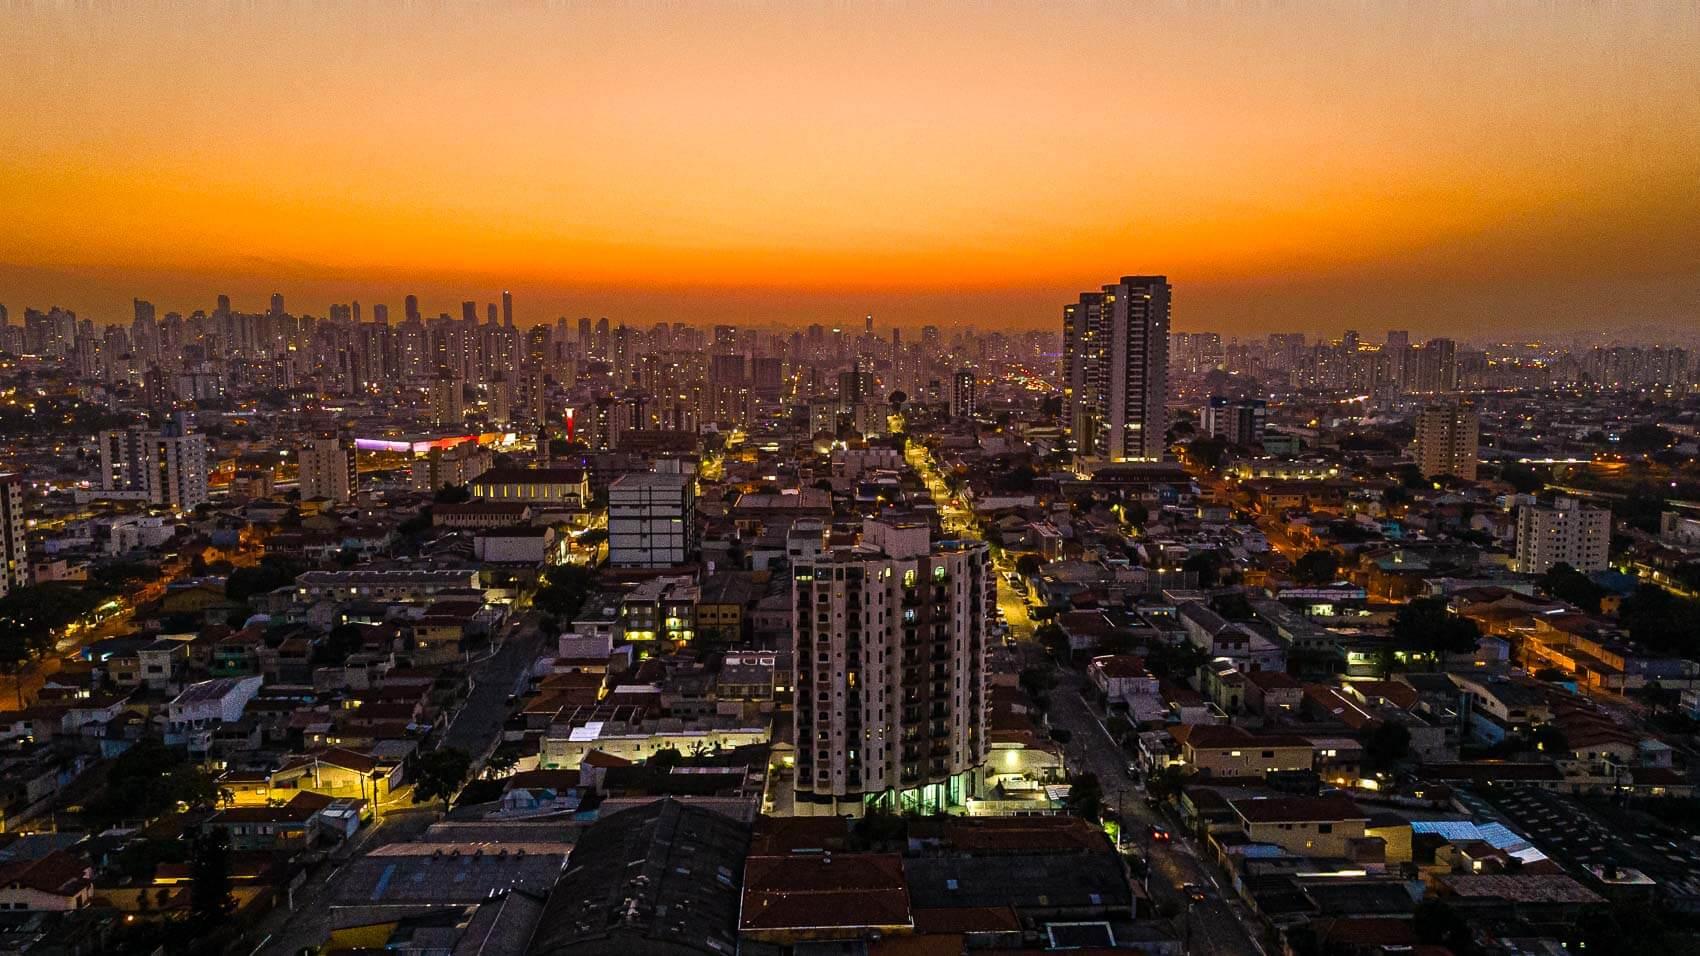 foto noturna com drone